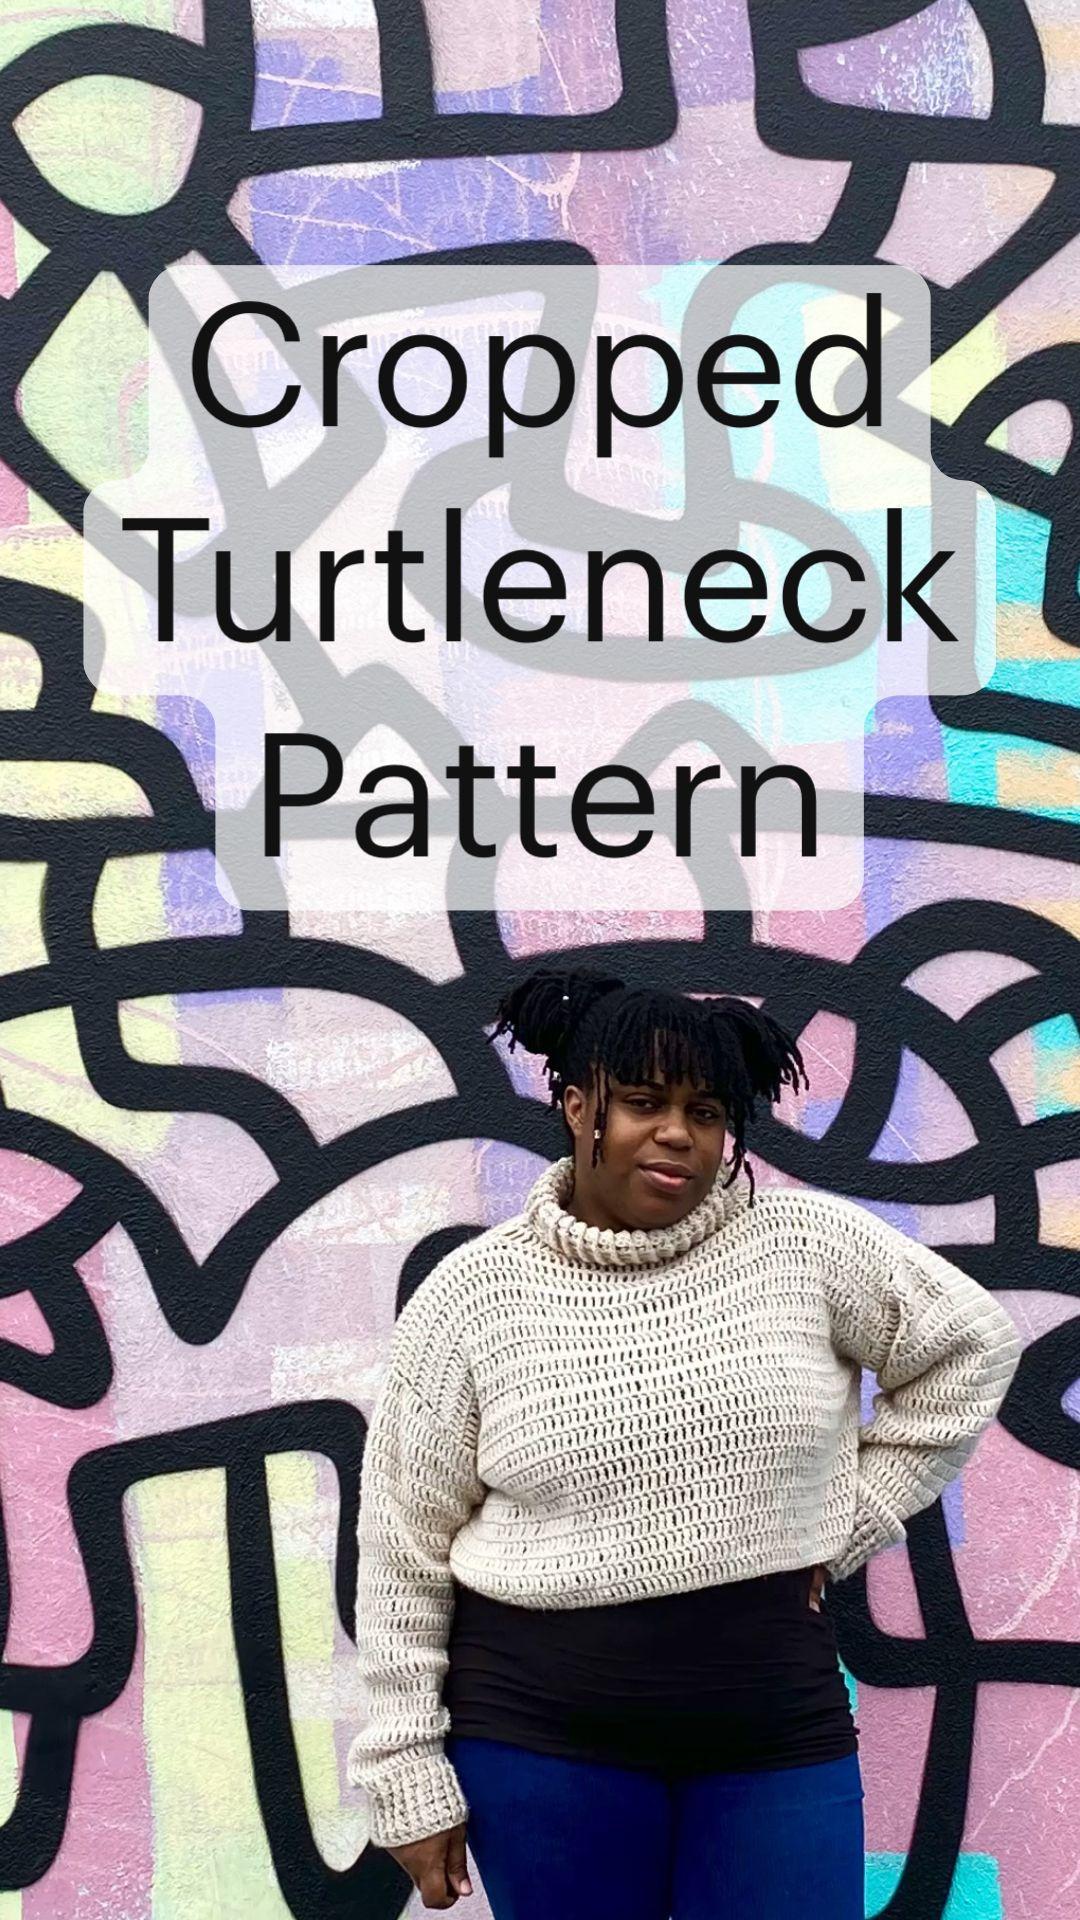 Cropped Turtleneck Pattern